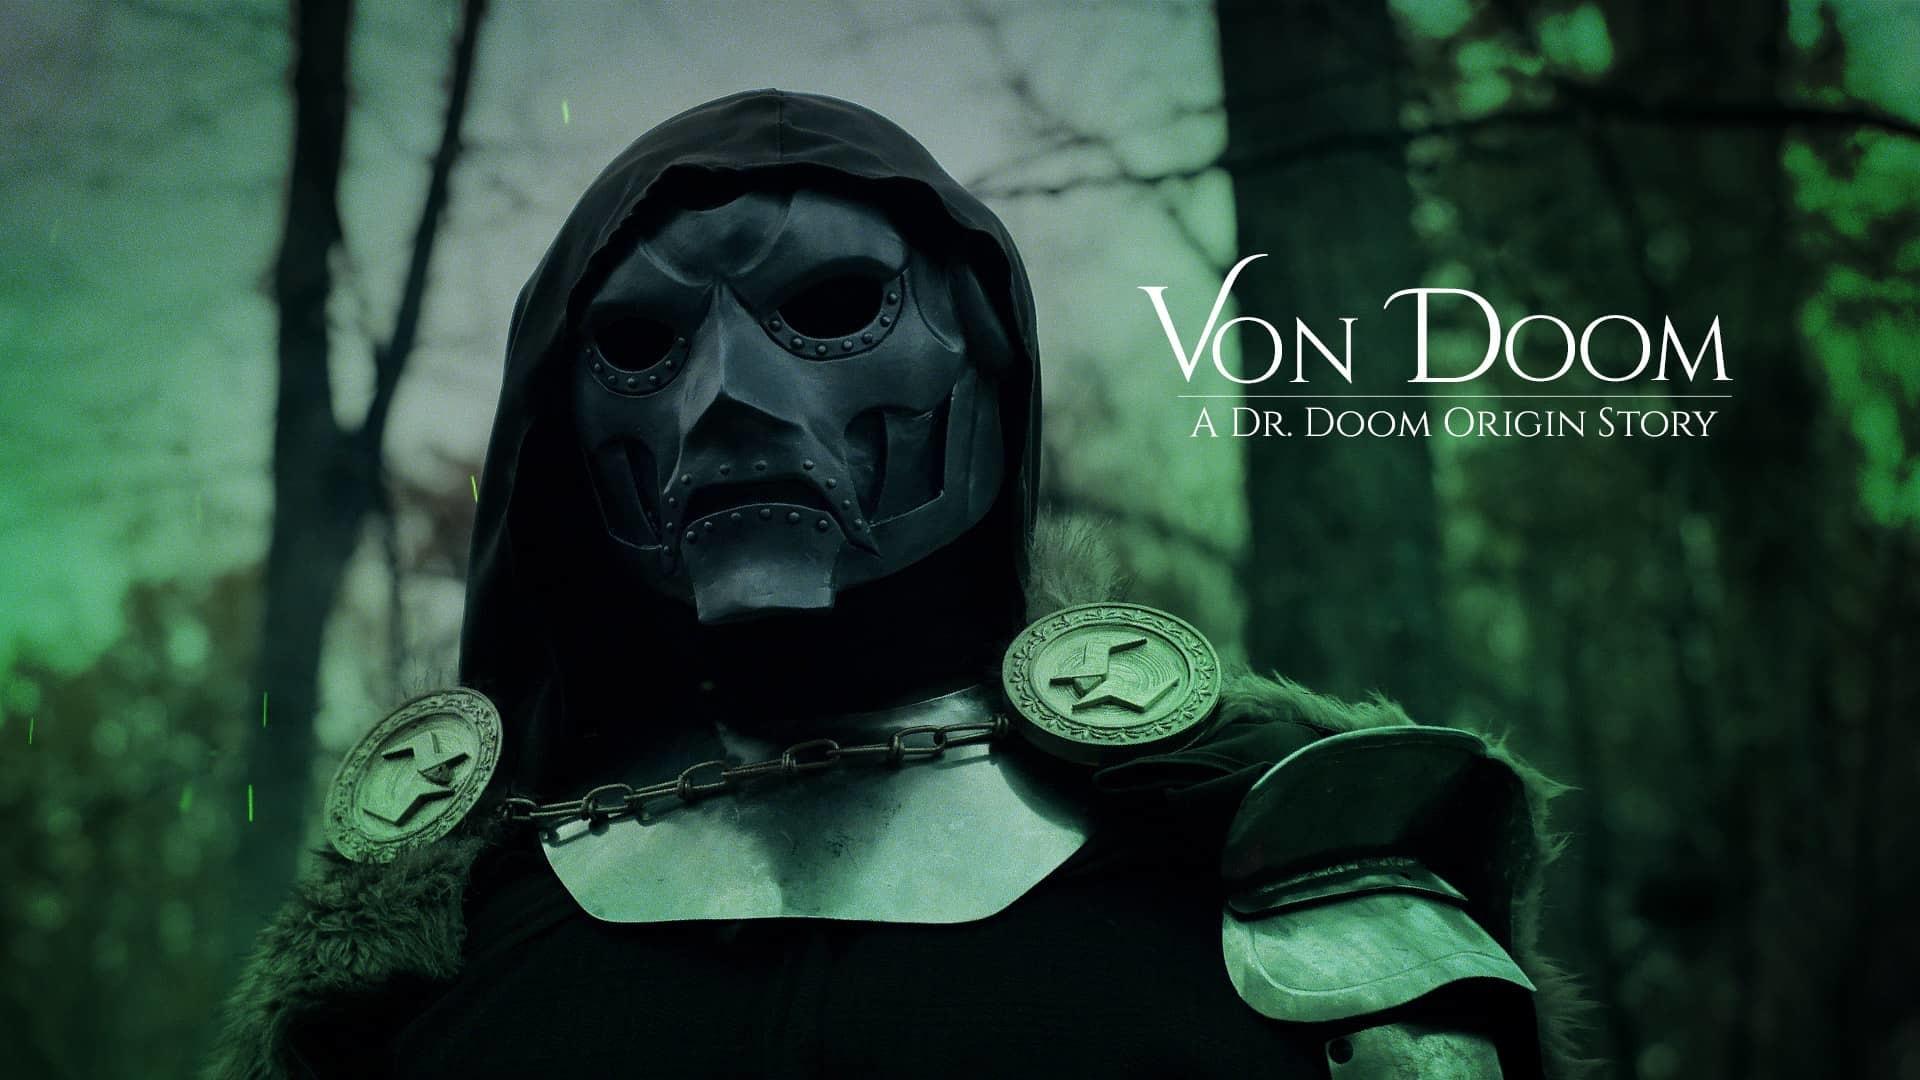 Fans Take It Upon Themselves to Give Victor Von Doom The Movie He Deserves  | nerdbastards.com